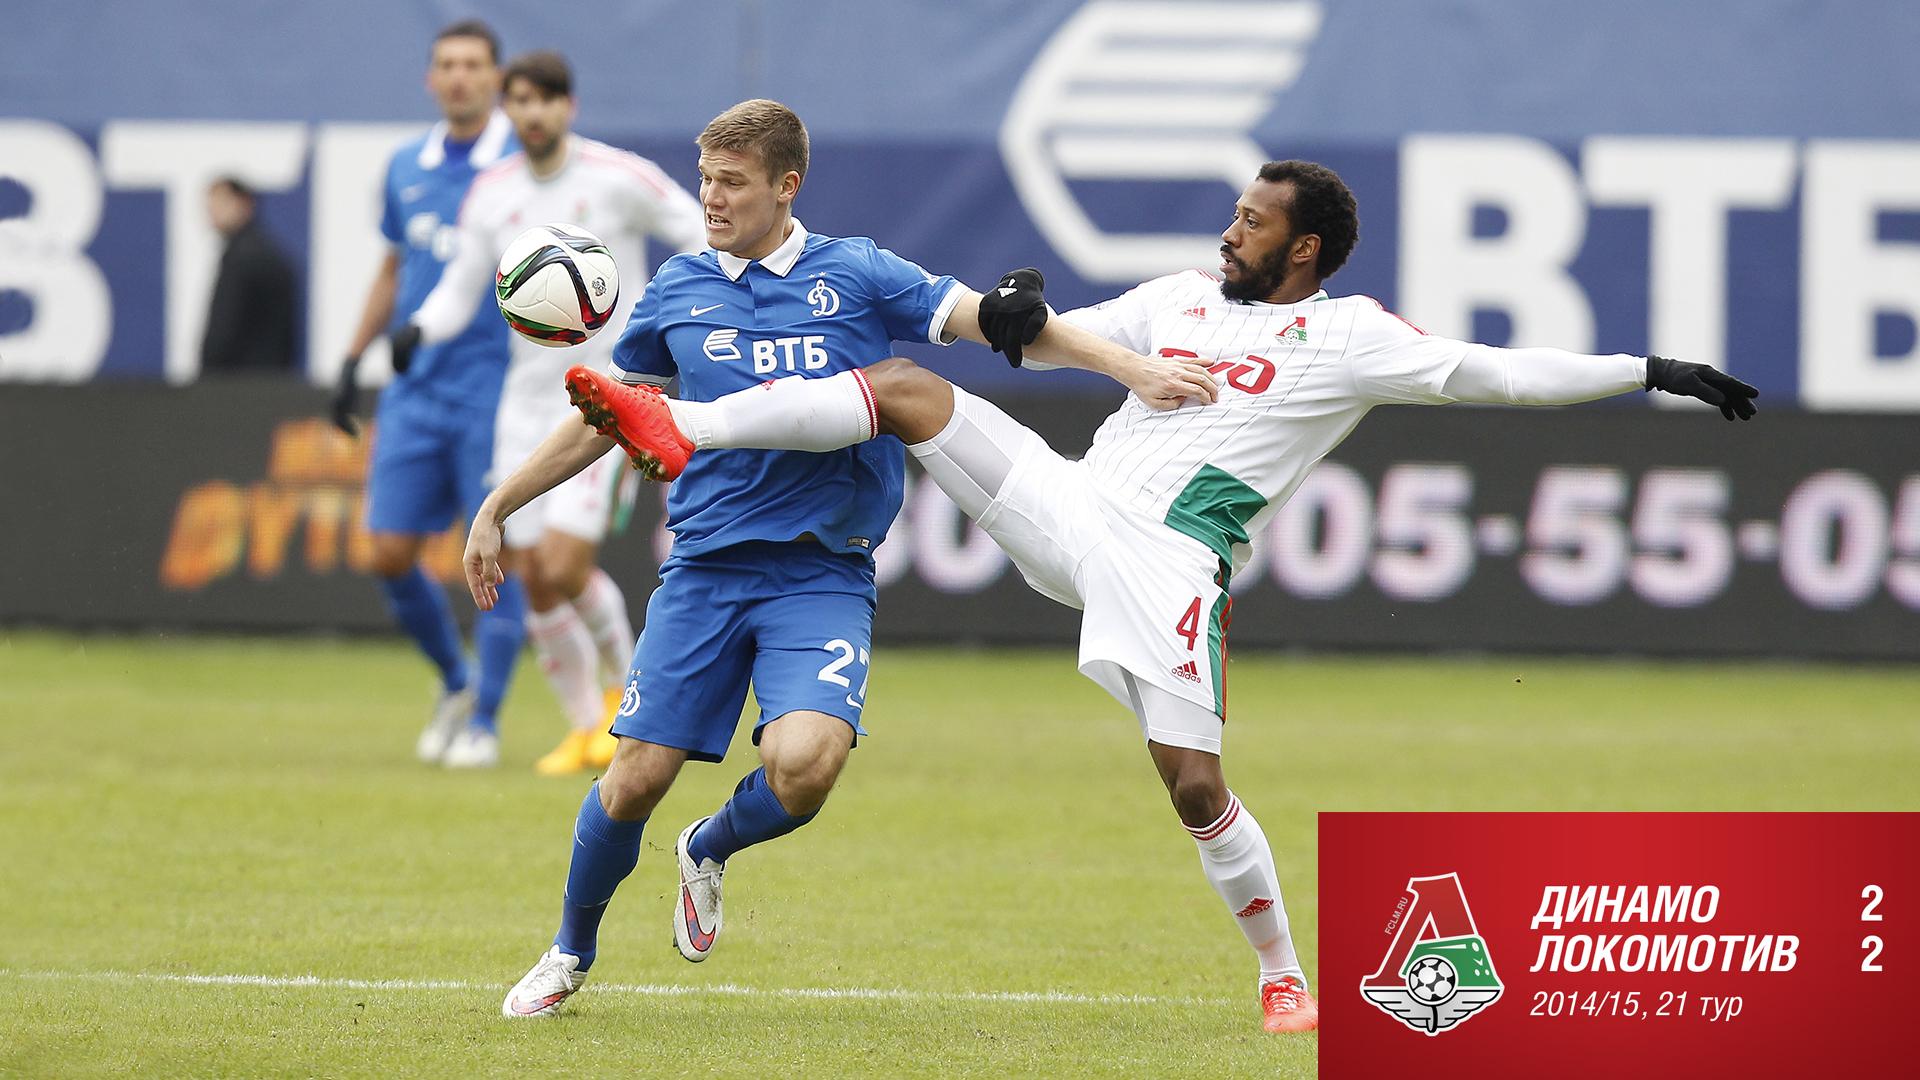 «Динамо» – «Локомотив» 2:2